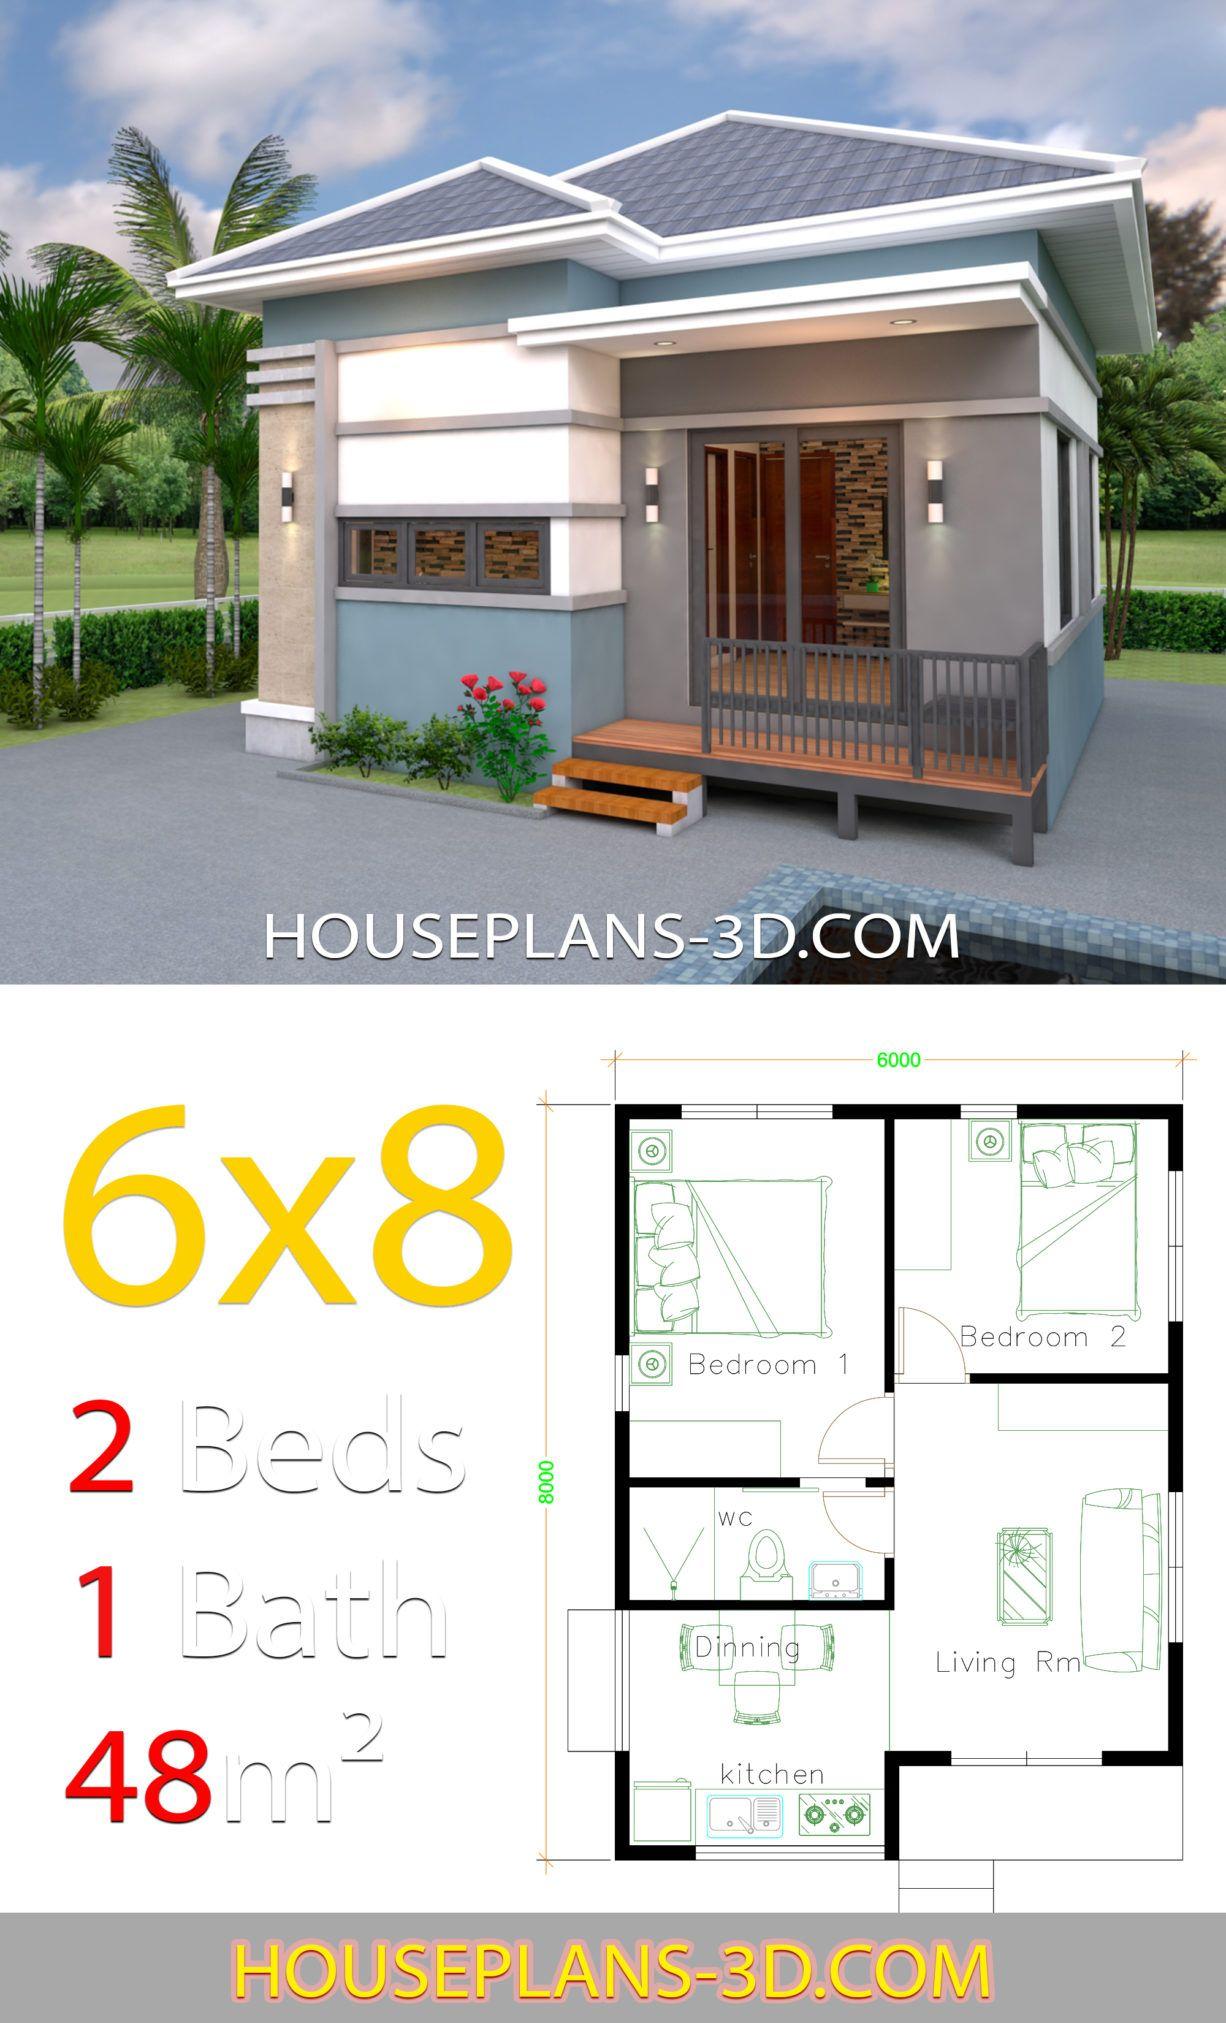 20+ 2 bedroom house plans 3d ideas